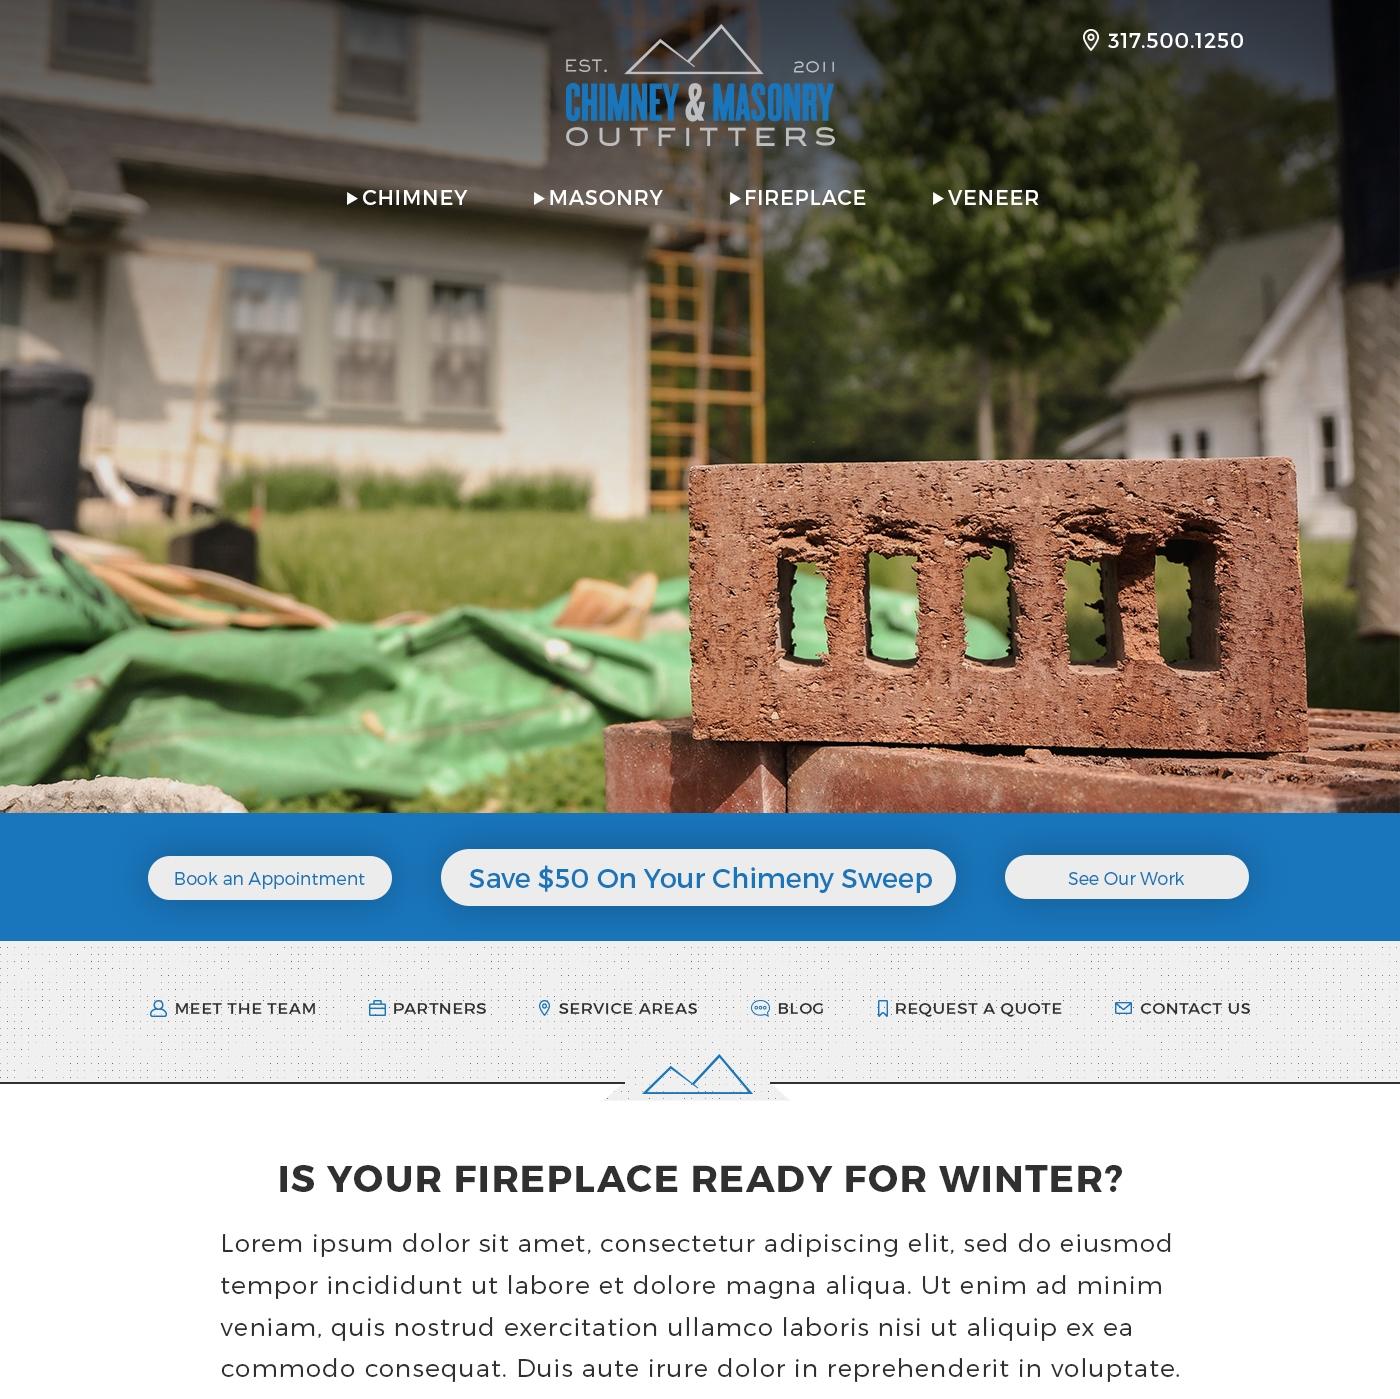 Chimney Masonry Outfitters Web Design